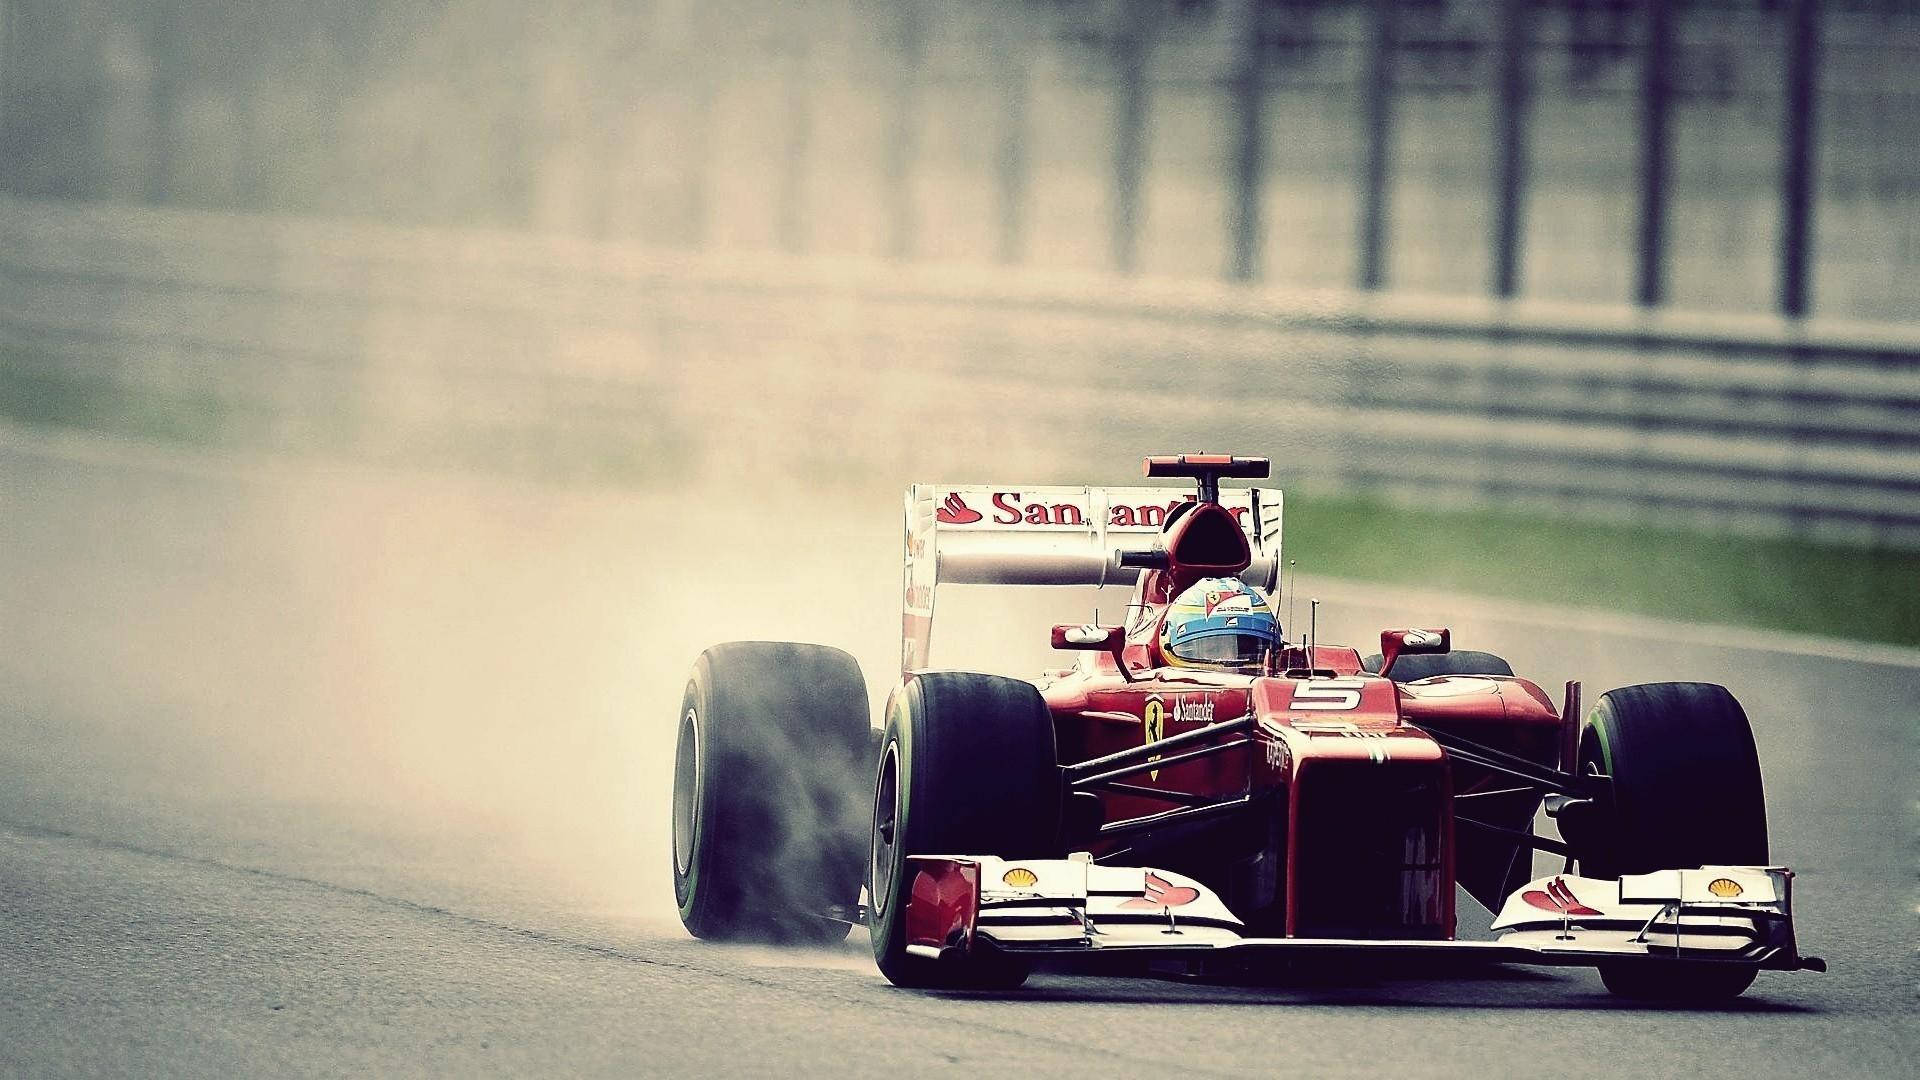 Formel 1 wallpaper iphone 11